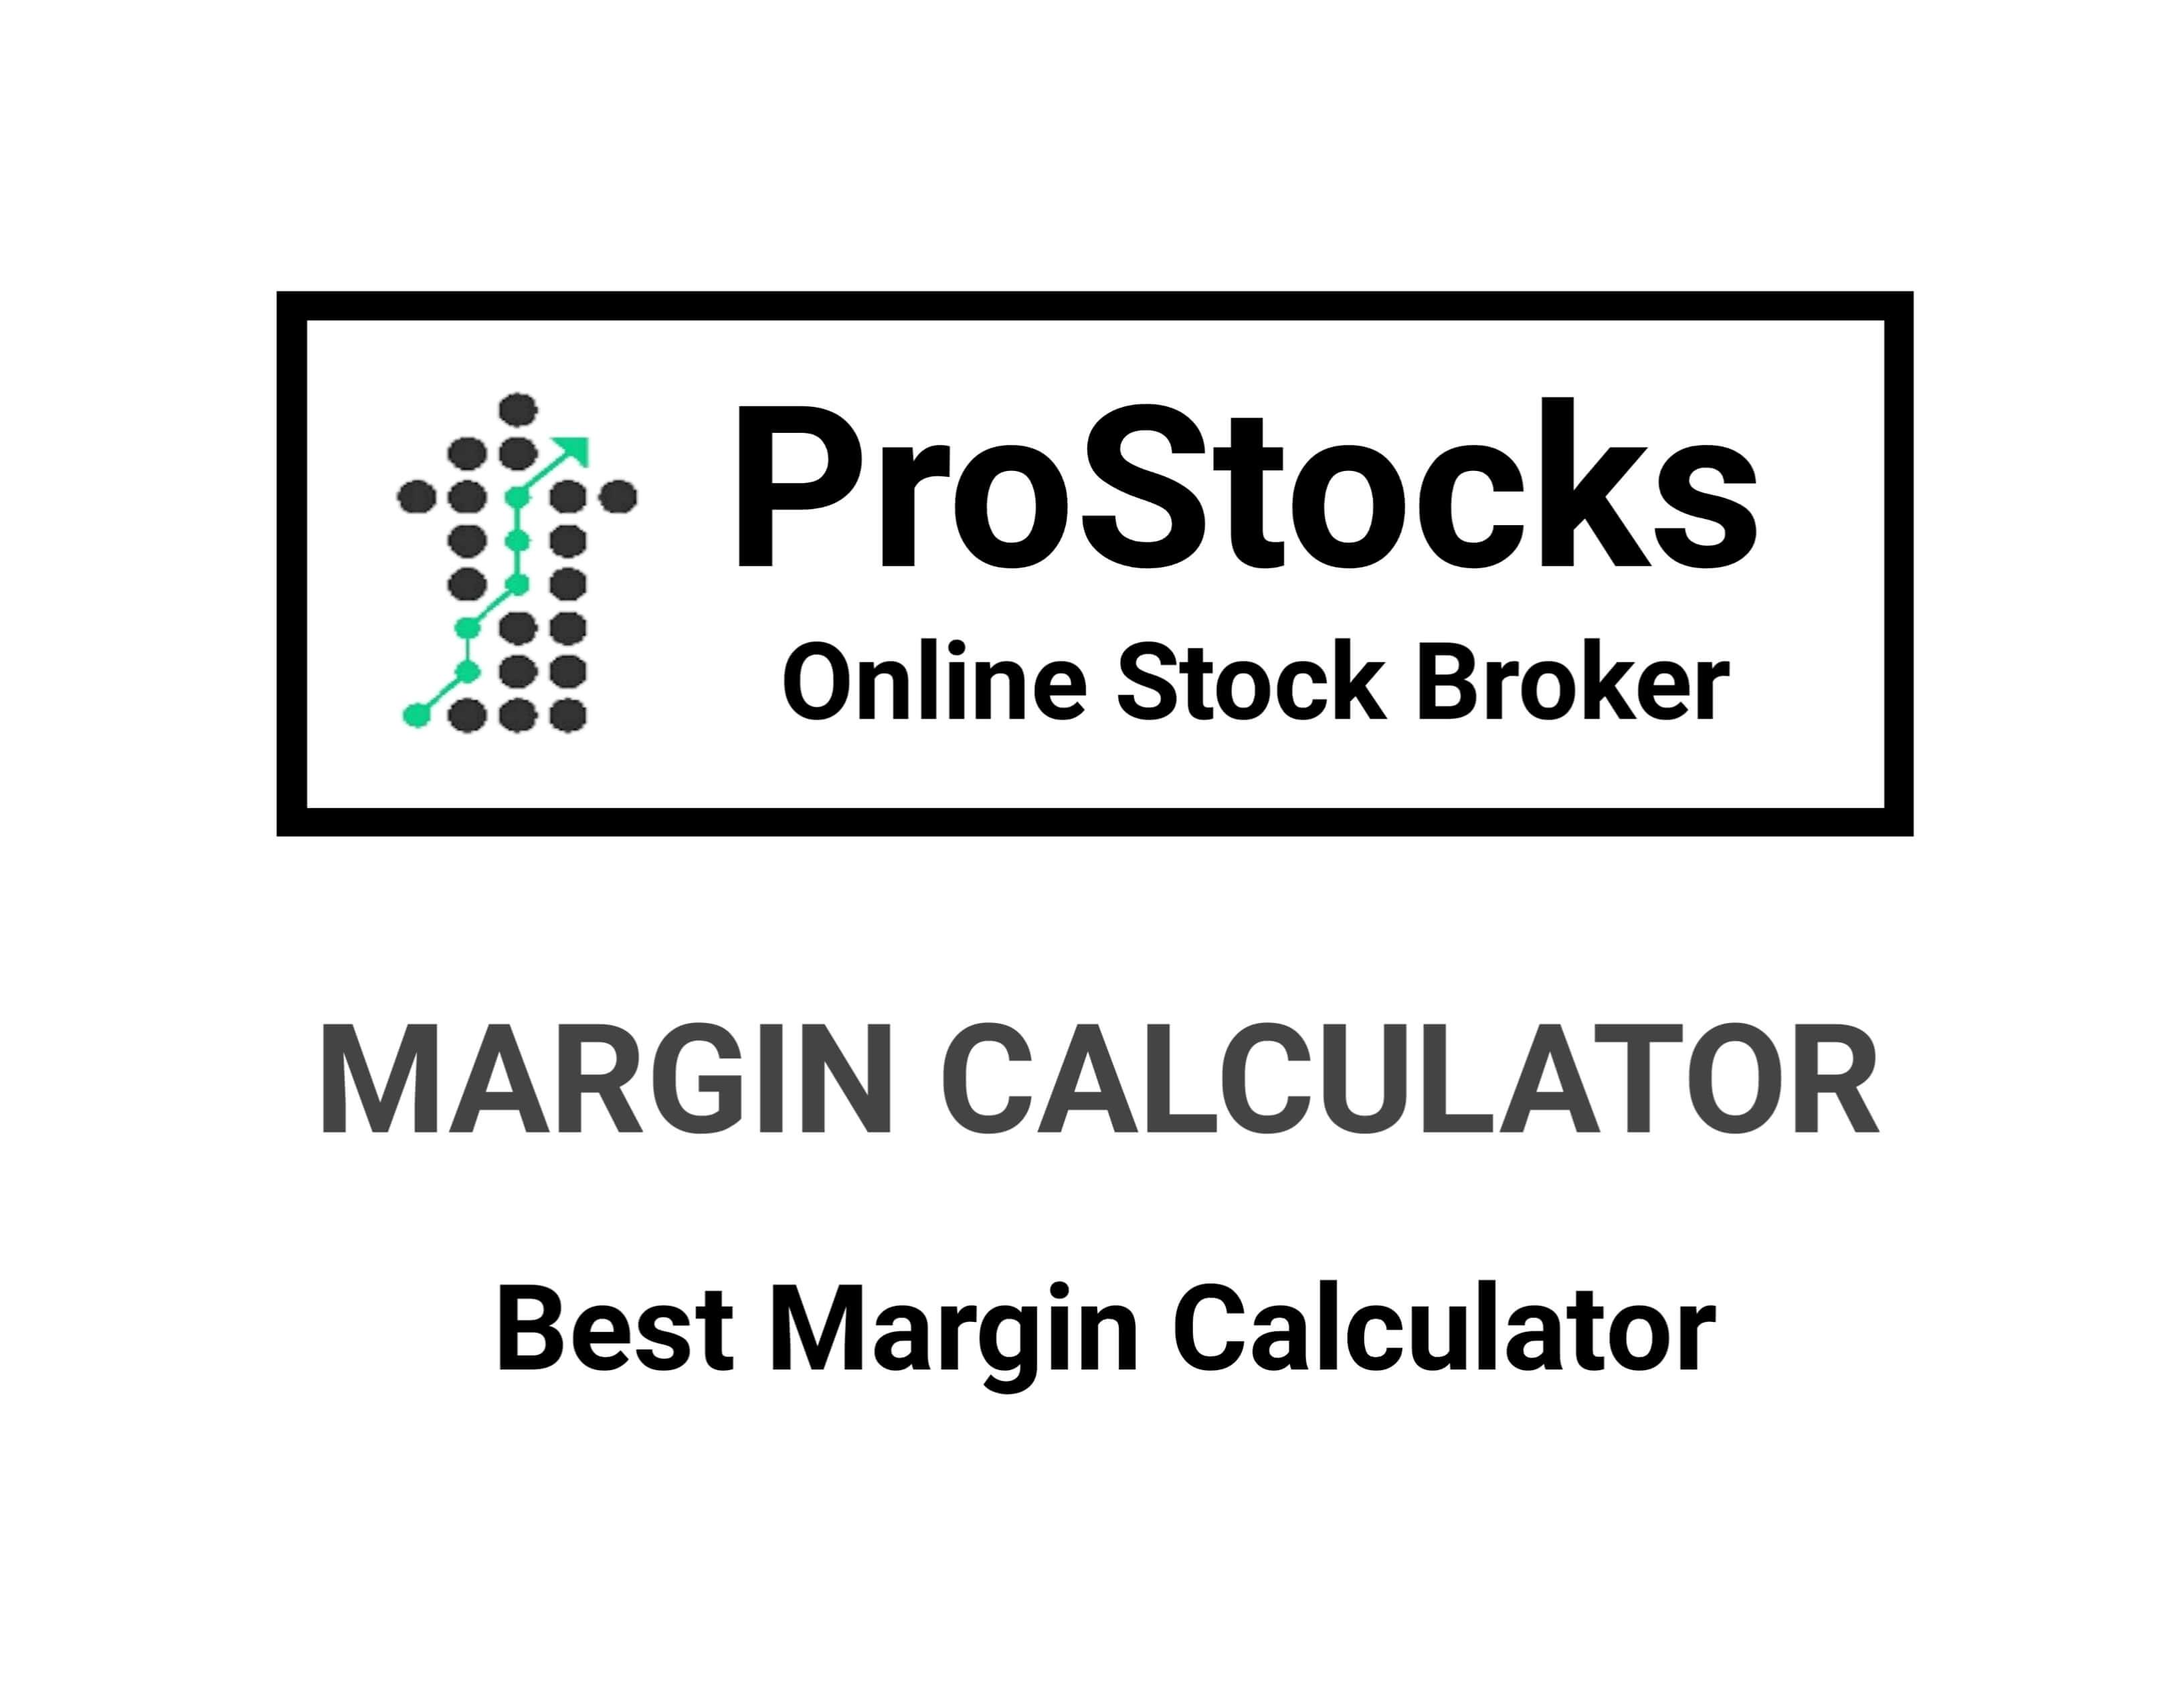 Pro stocks Margin calculator